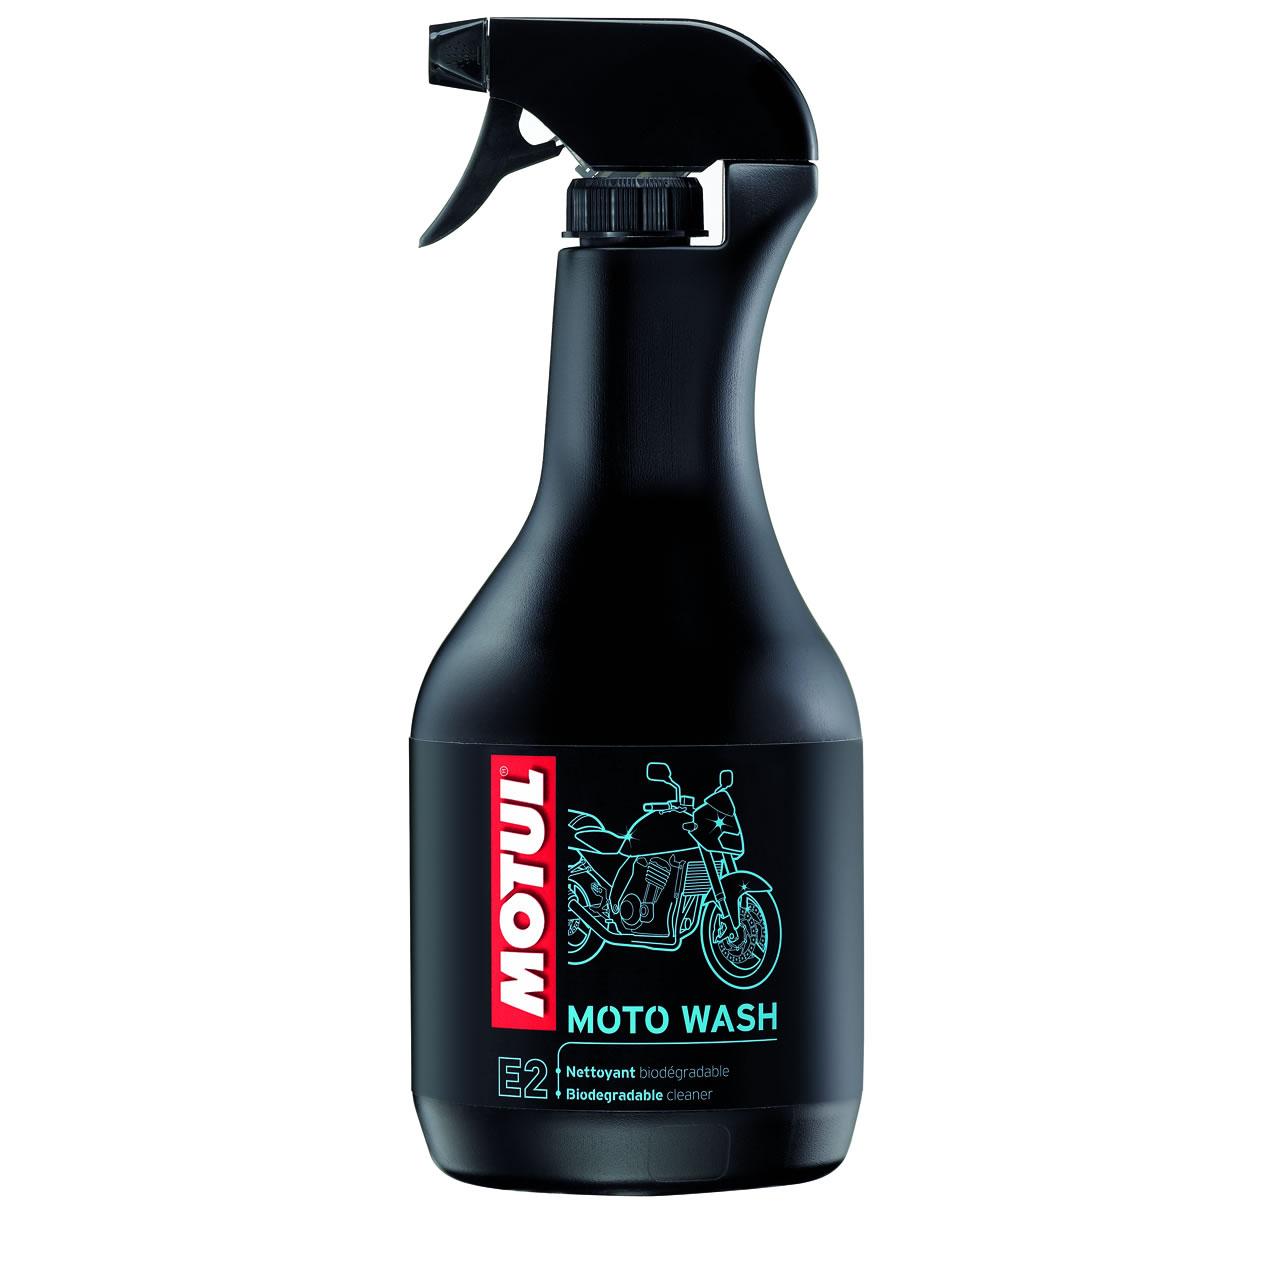 Motul Moto Wash (104881